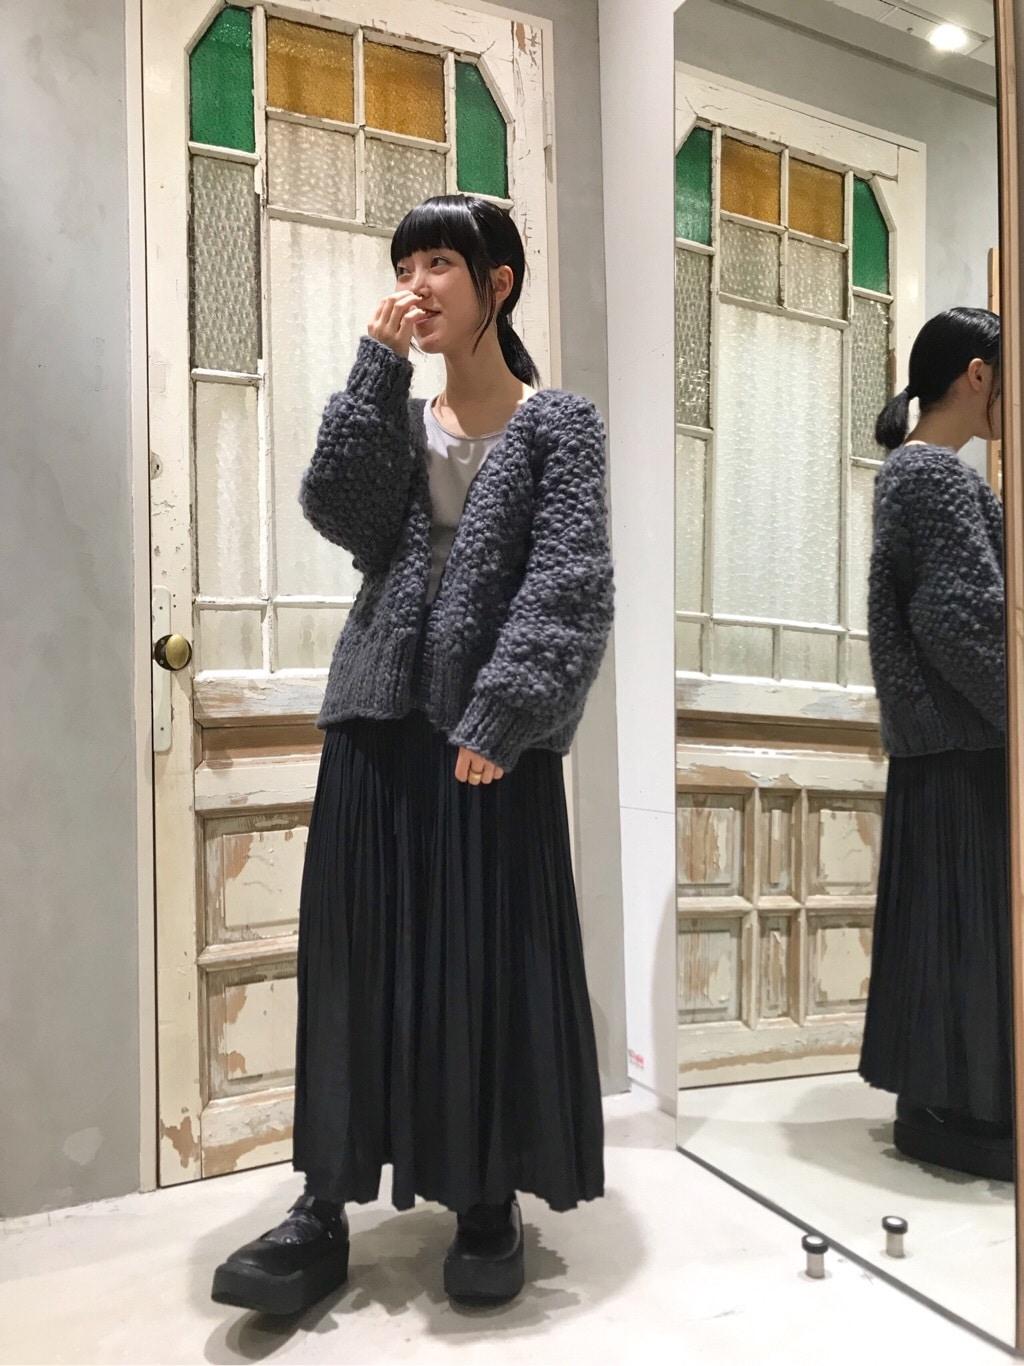 yuni 東急プラザ銀座 身長:153cm 2019.10.07